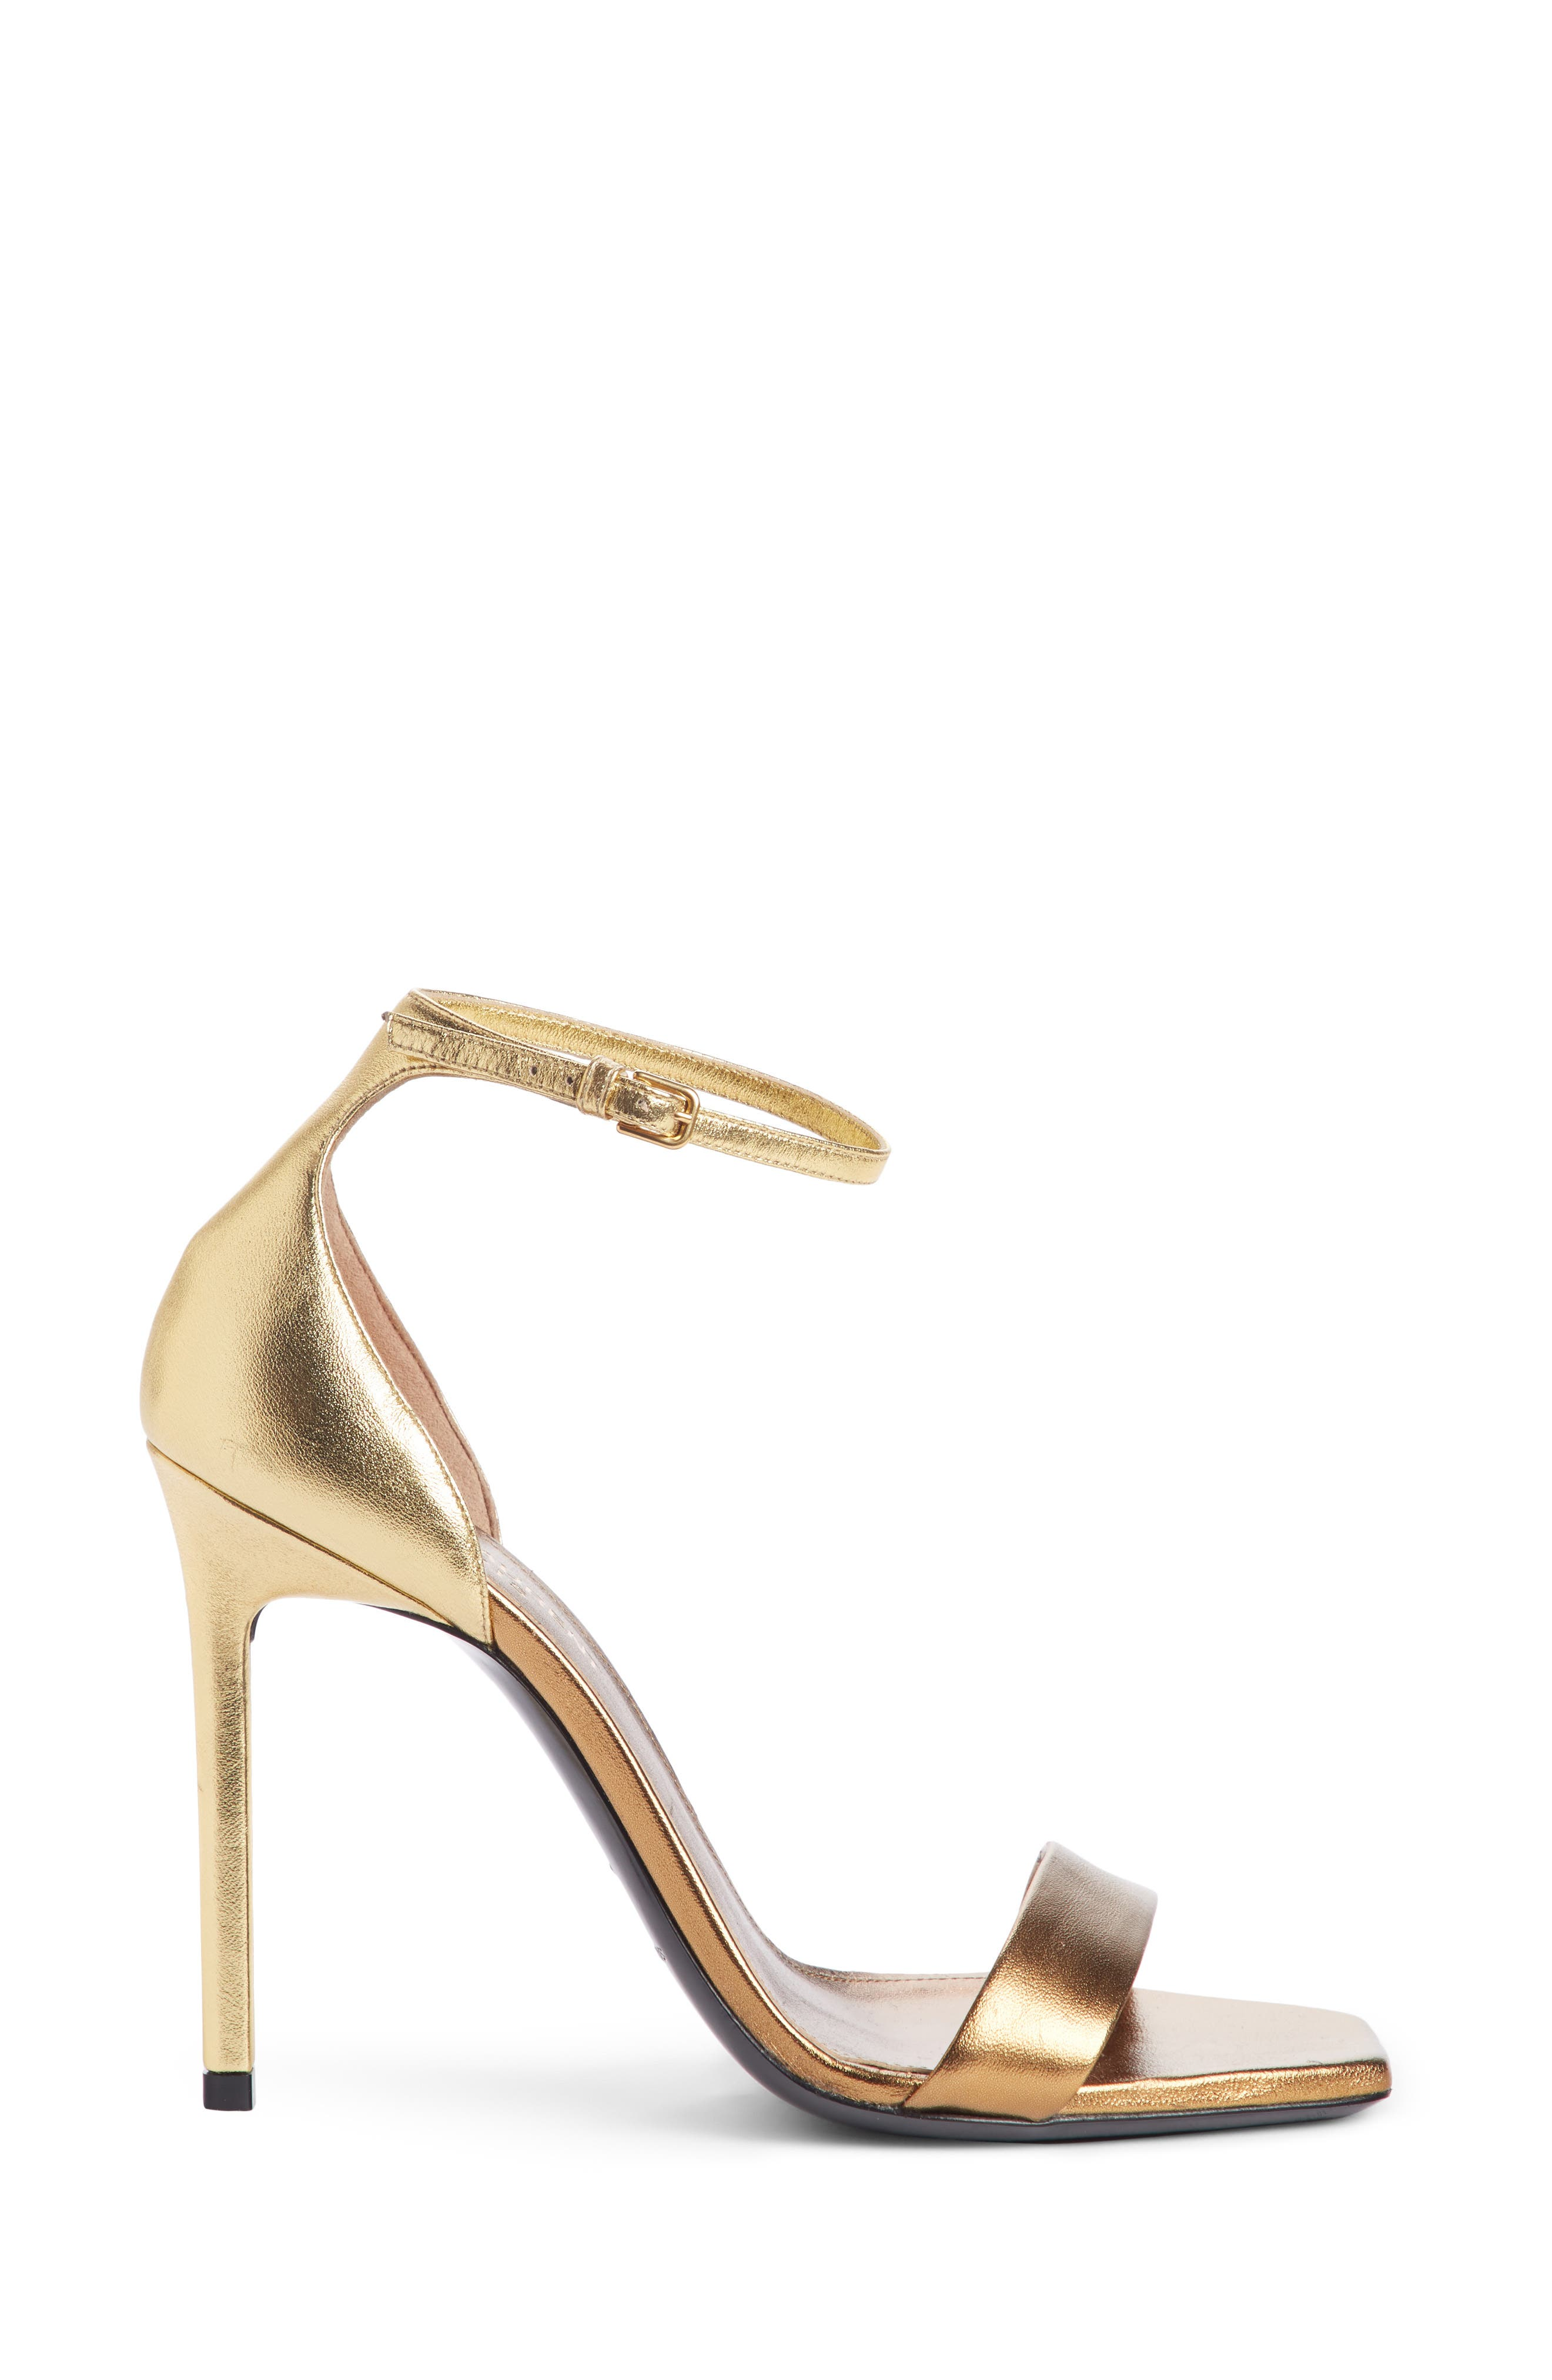 Amber Ankle Strap Sandal,                             Alternate thumbnail 4, color,                             Bronze Gold